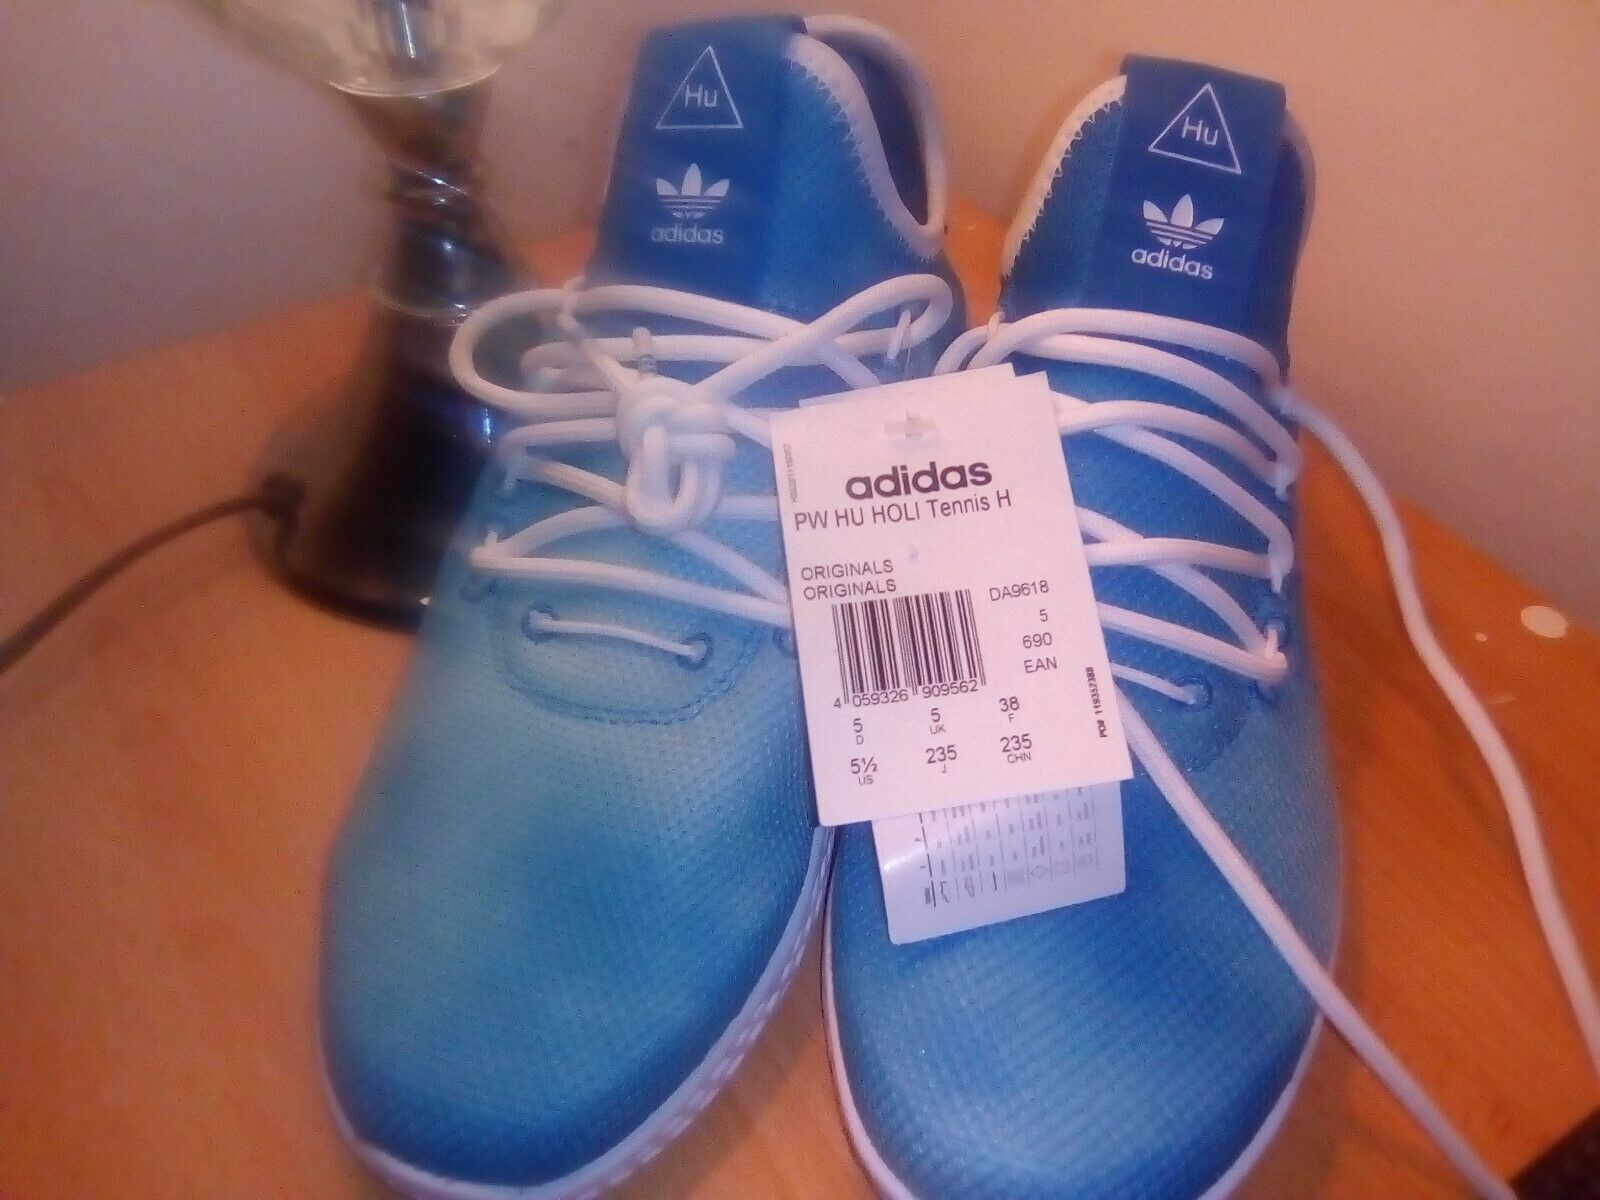 Adidas Originals Pharrell Williams Tennis HU Trainers bleu UK 5